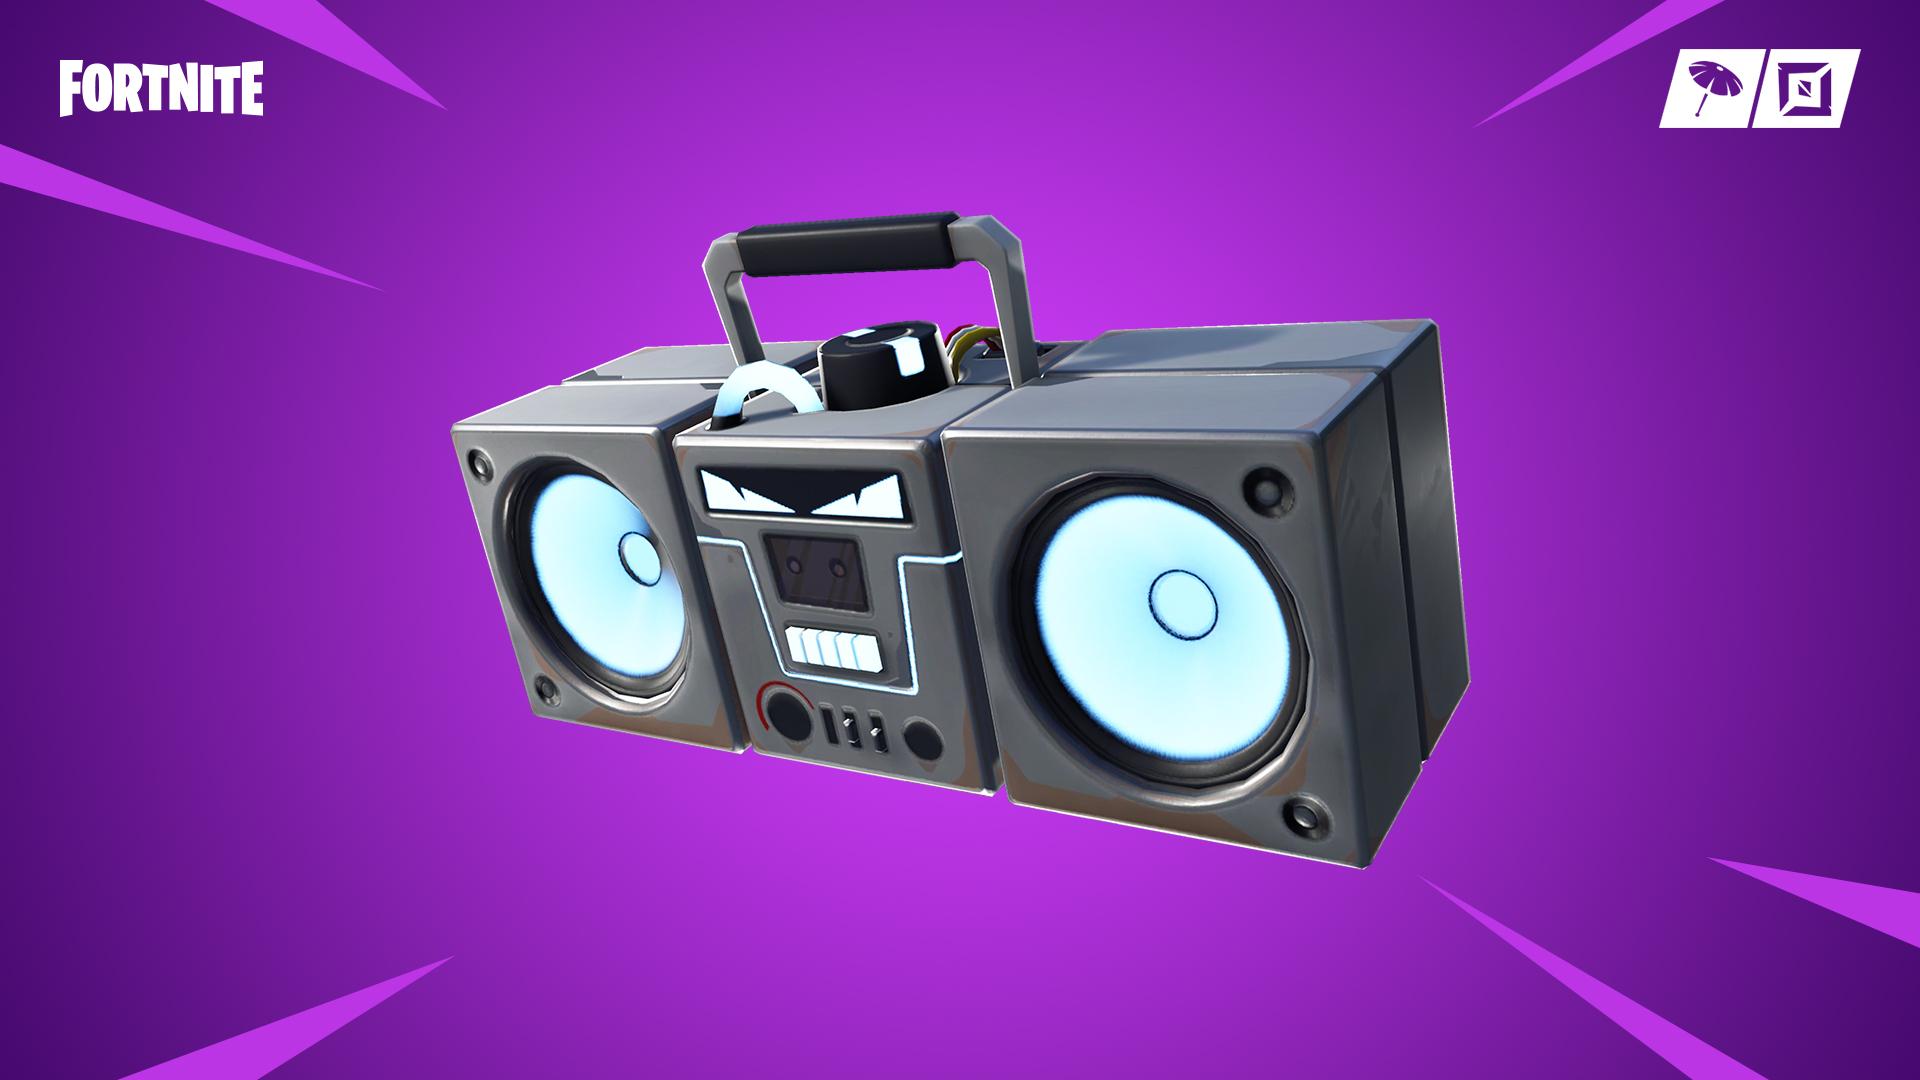 boombox-fortnite